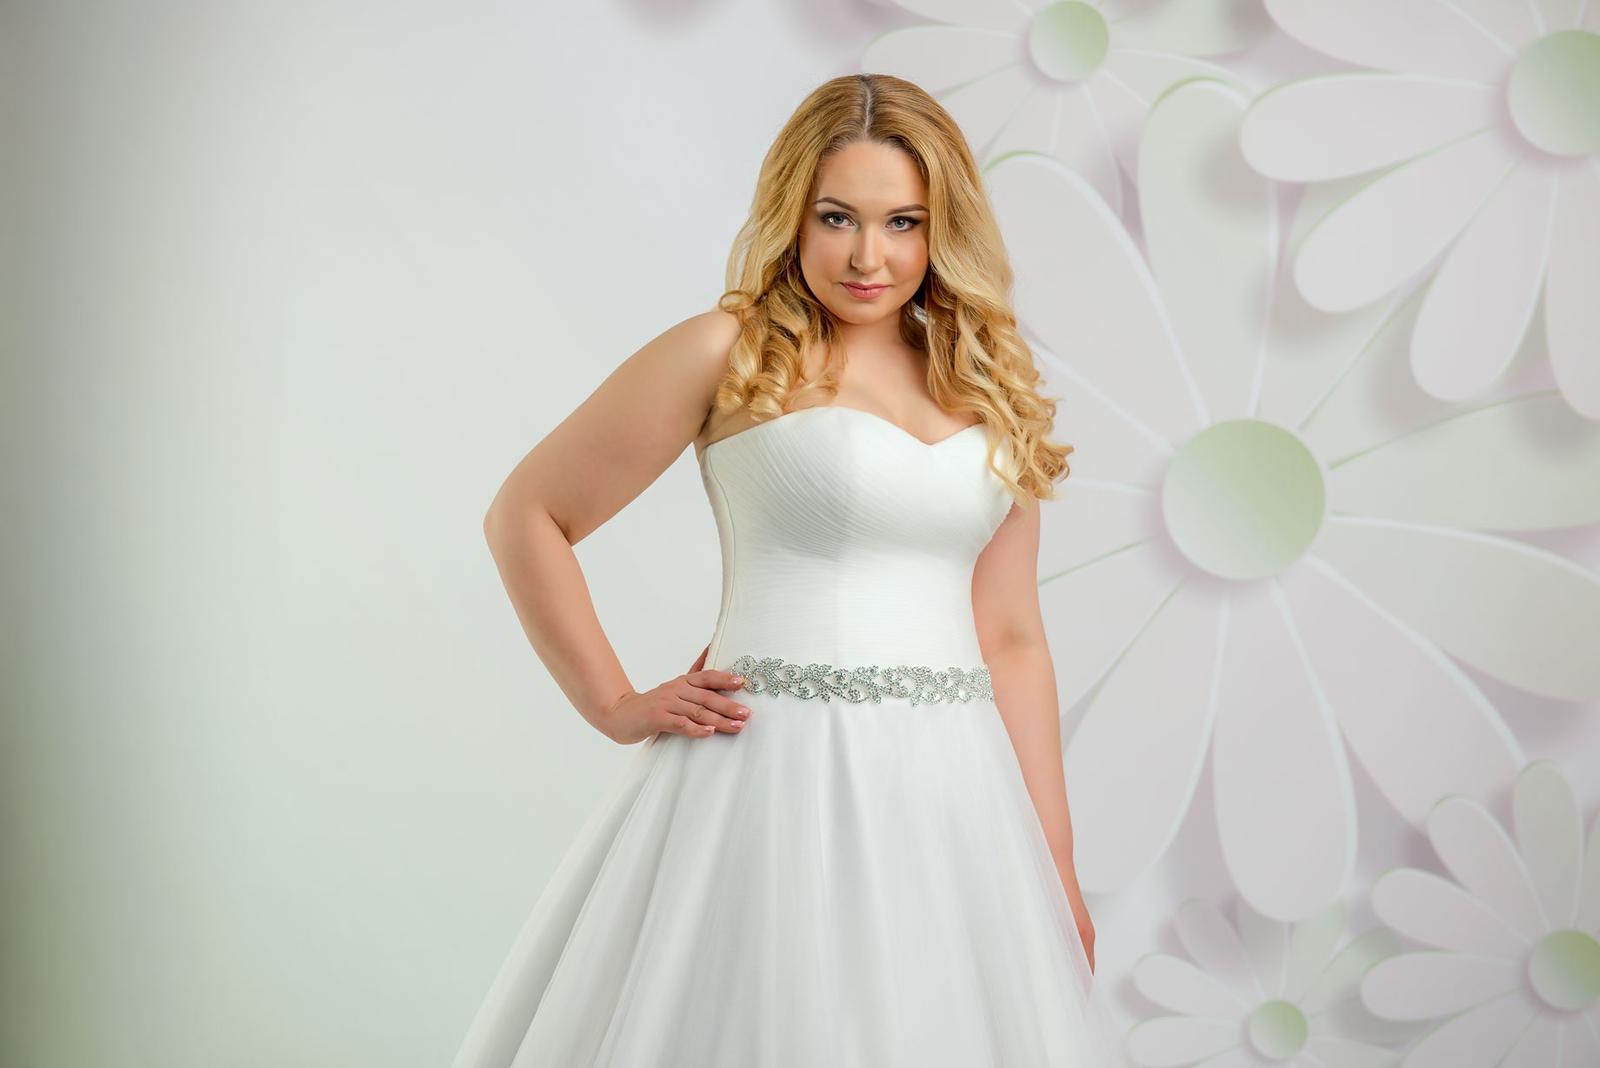 d9e2a3e0ba6f Luxusné svadobné šaty s vrstvenou tylovou sukňou